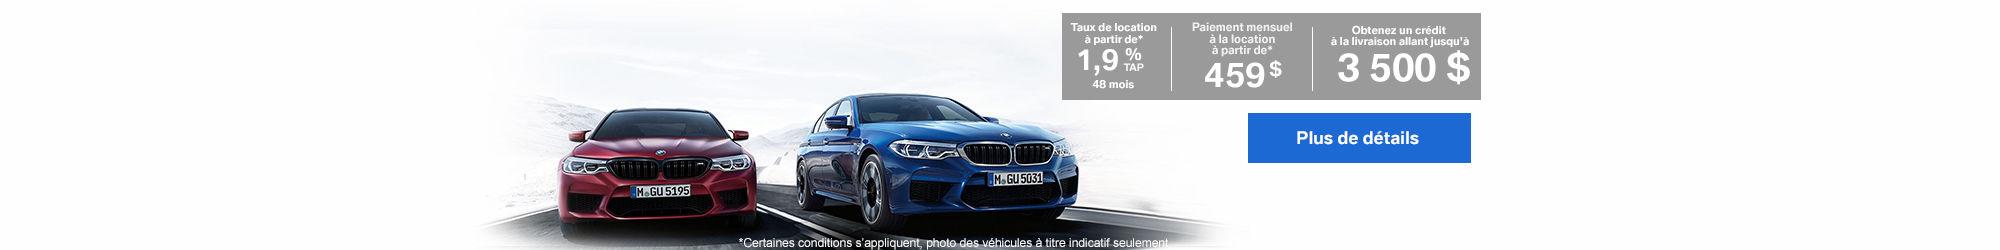 L'evenement BMW mensuel